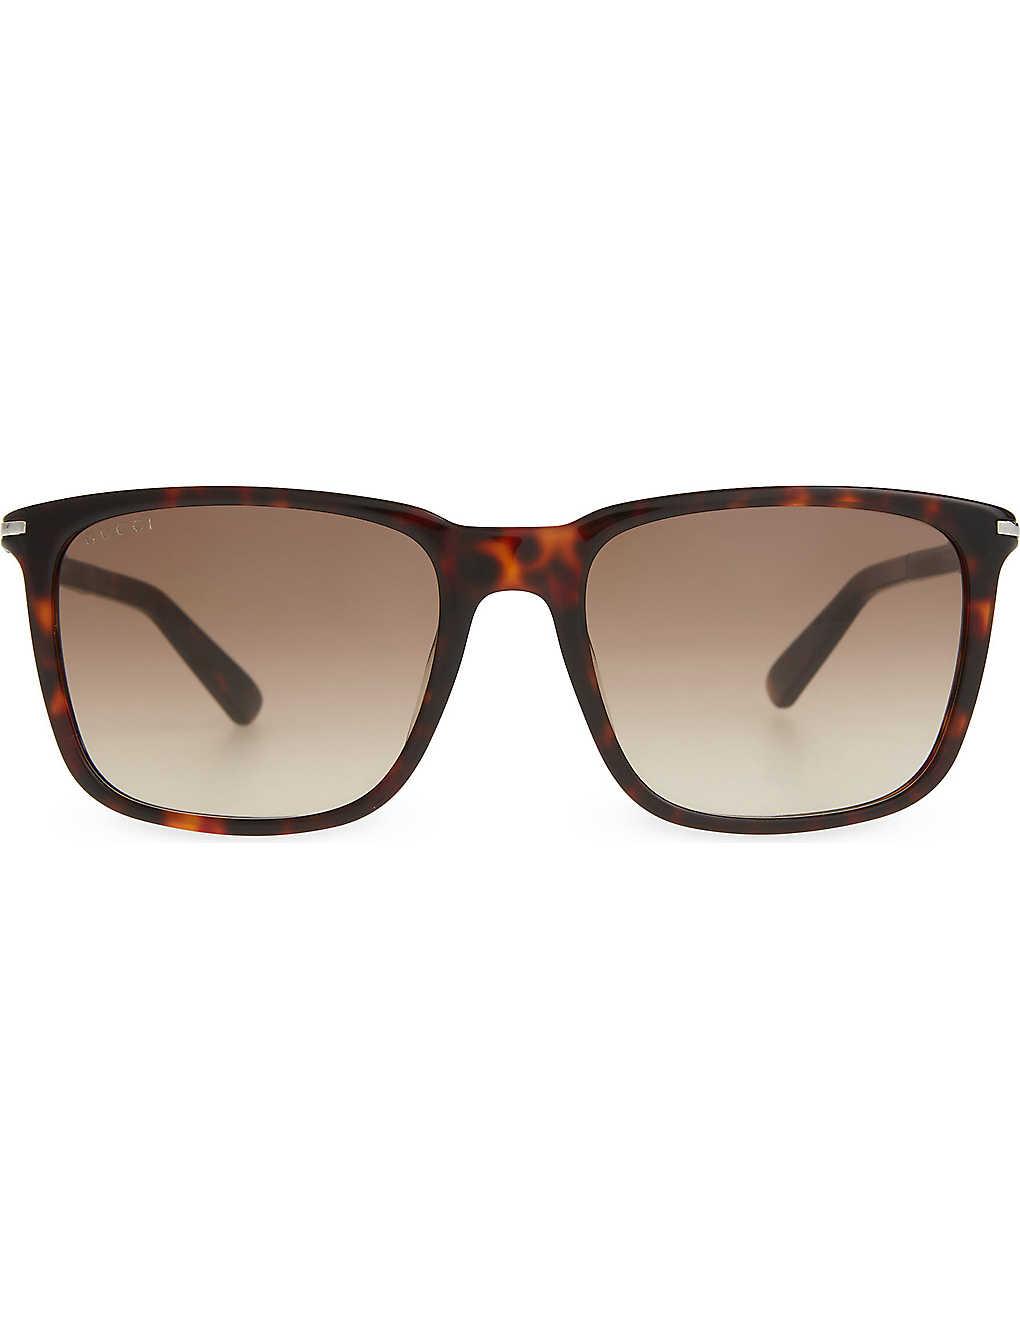 7428085373240 GUCCI - G1104 round tortoise shell sunglasses